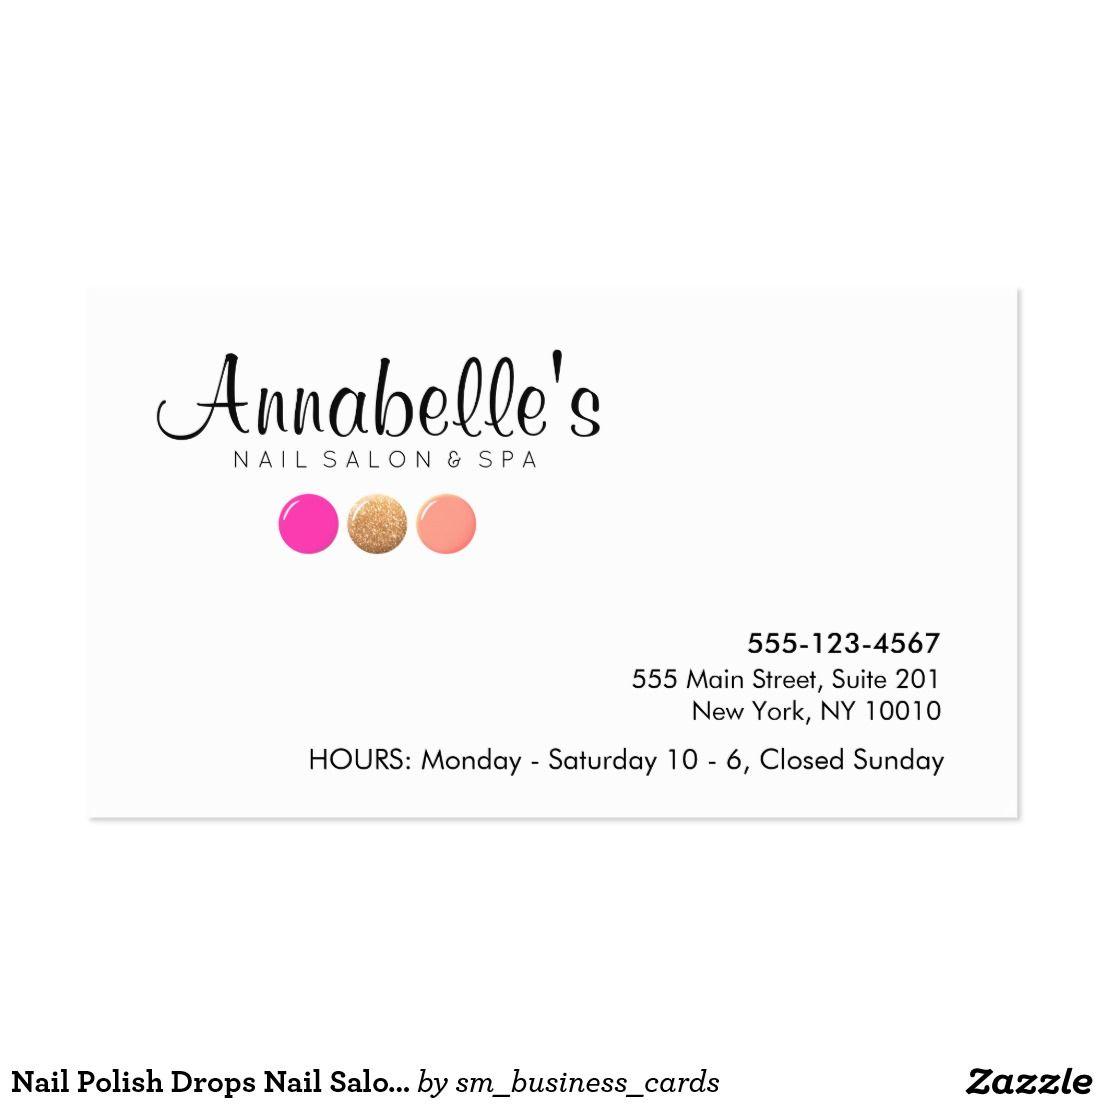 Nail Polish Drops Nail Salon Manicurist Business Card | Manicurist ...